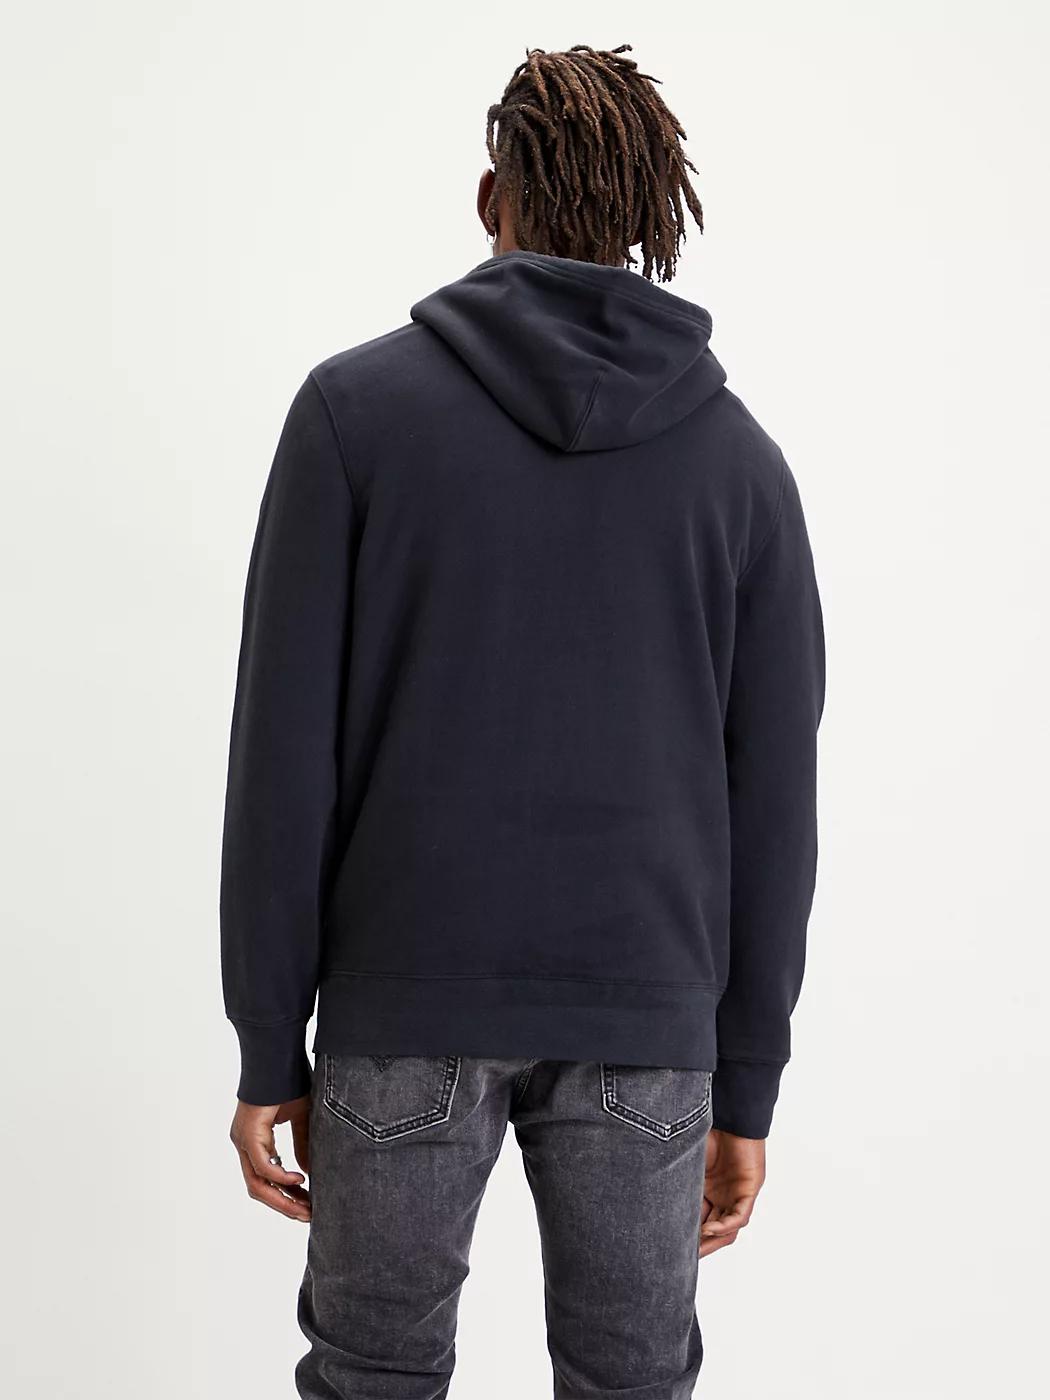 Levi's Original Housemark hoodie, black, large